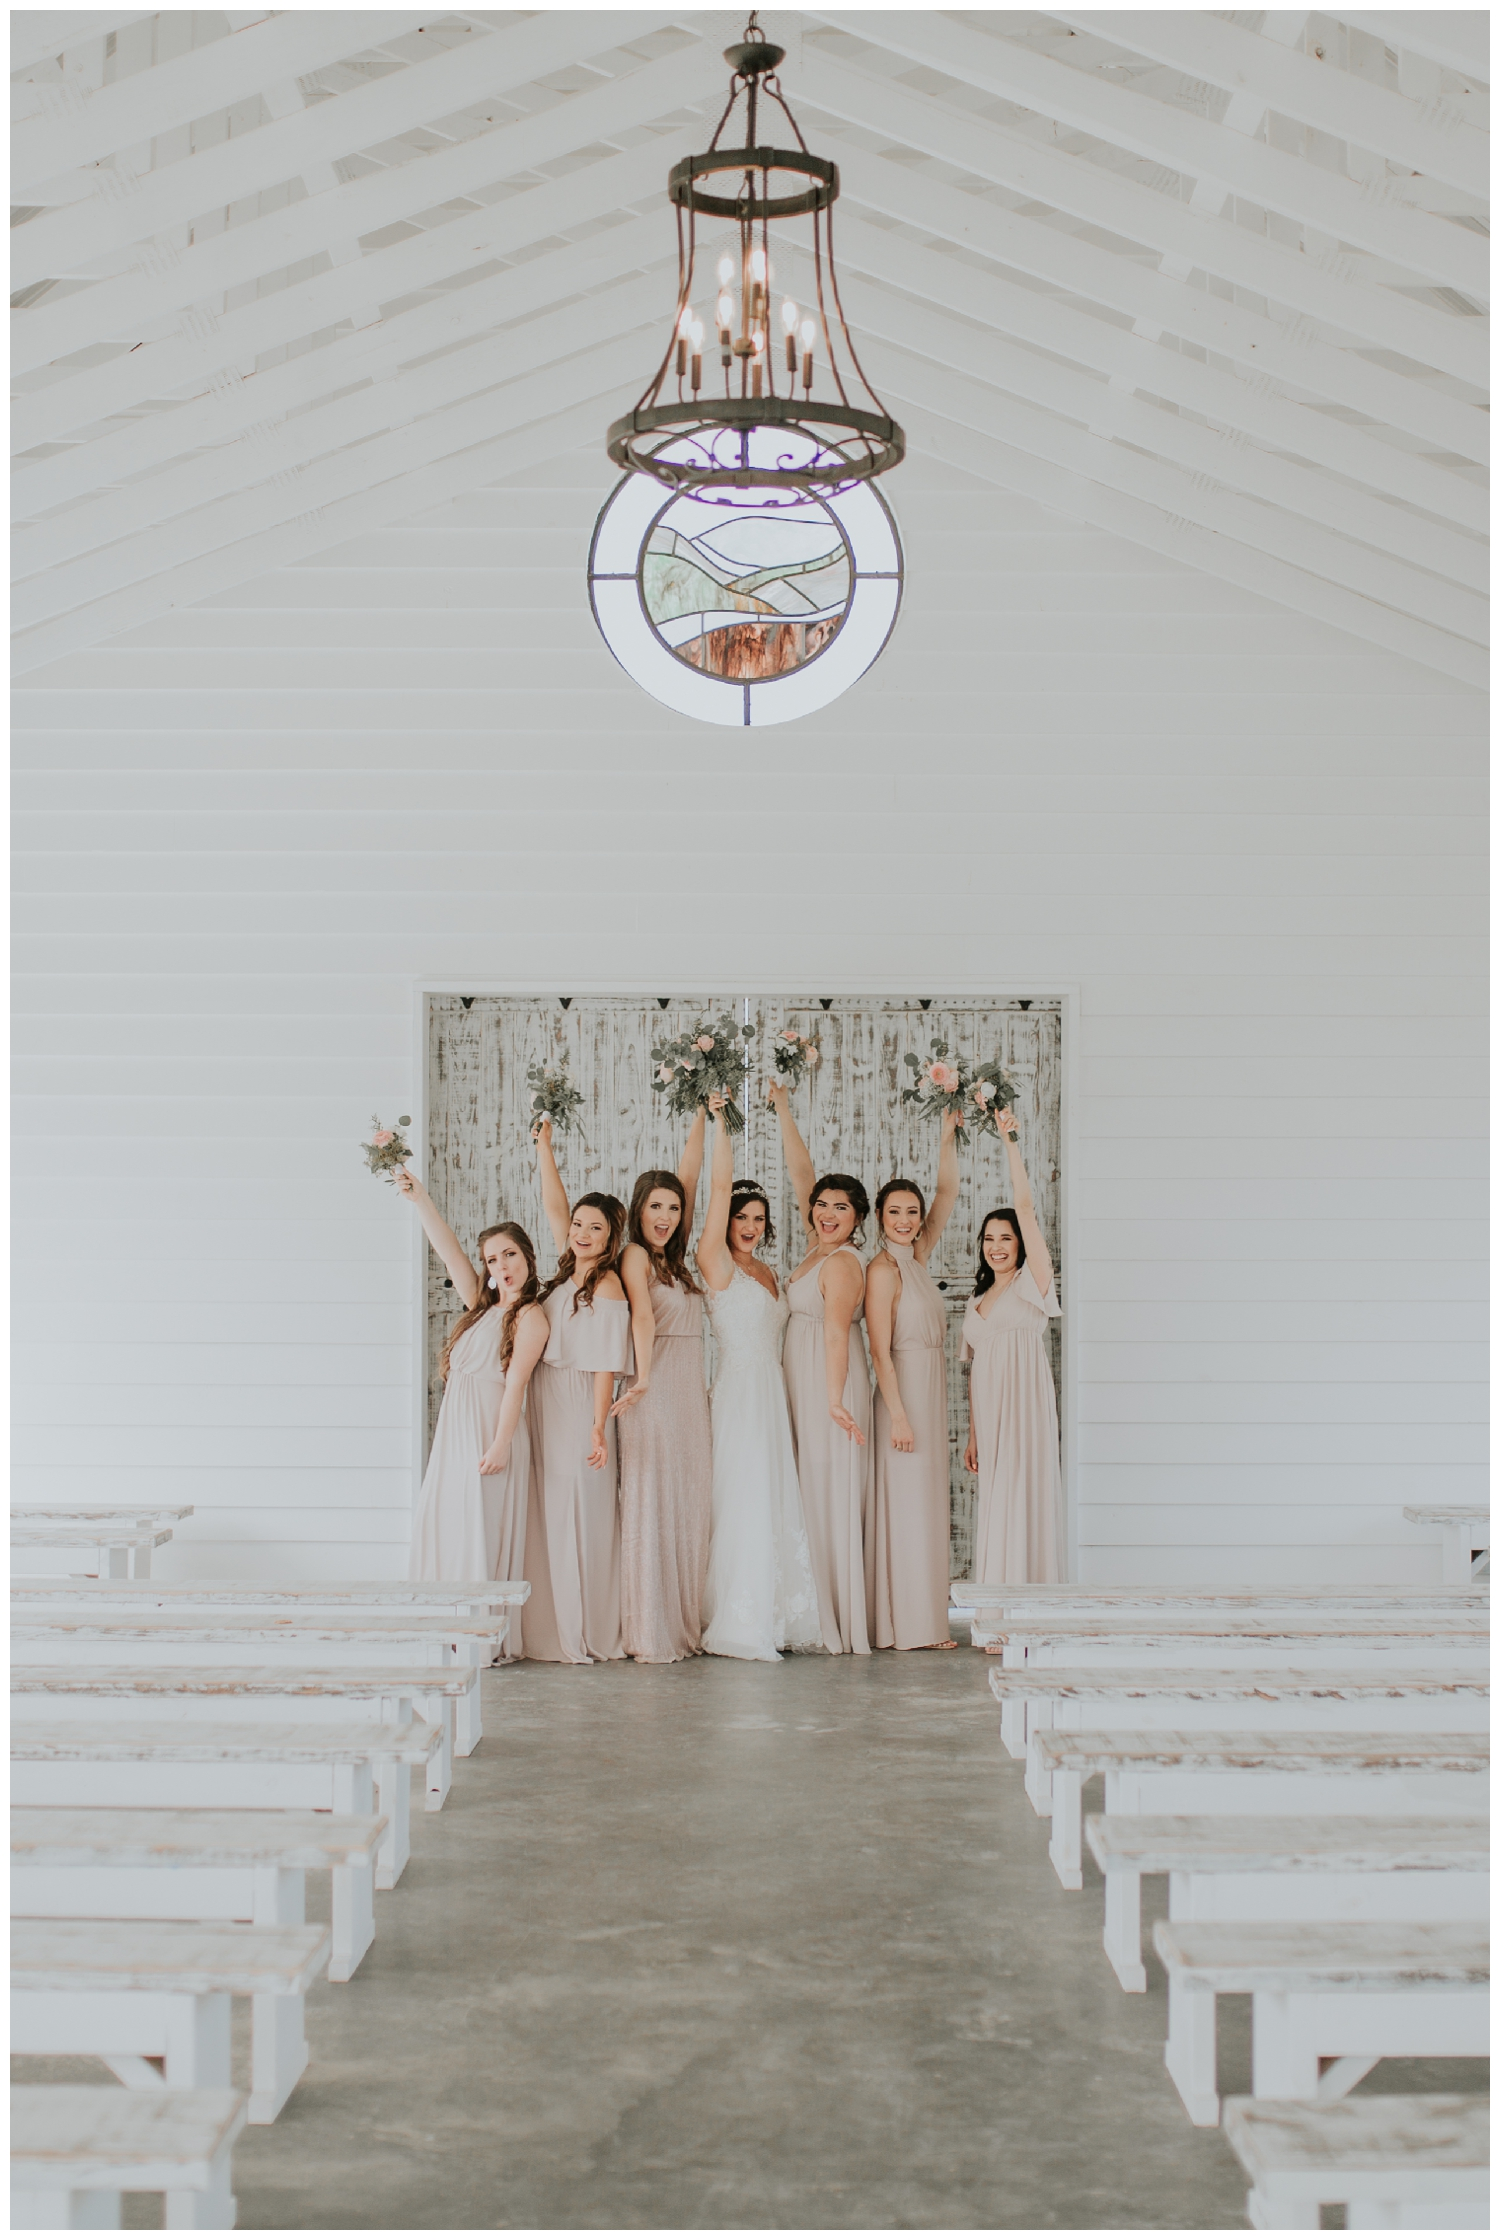 Ashlee+Mike, Featherstone Ranch Spring Wedding, San Antonio, Contista Productions Wedding Photography_0035.jpg